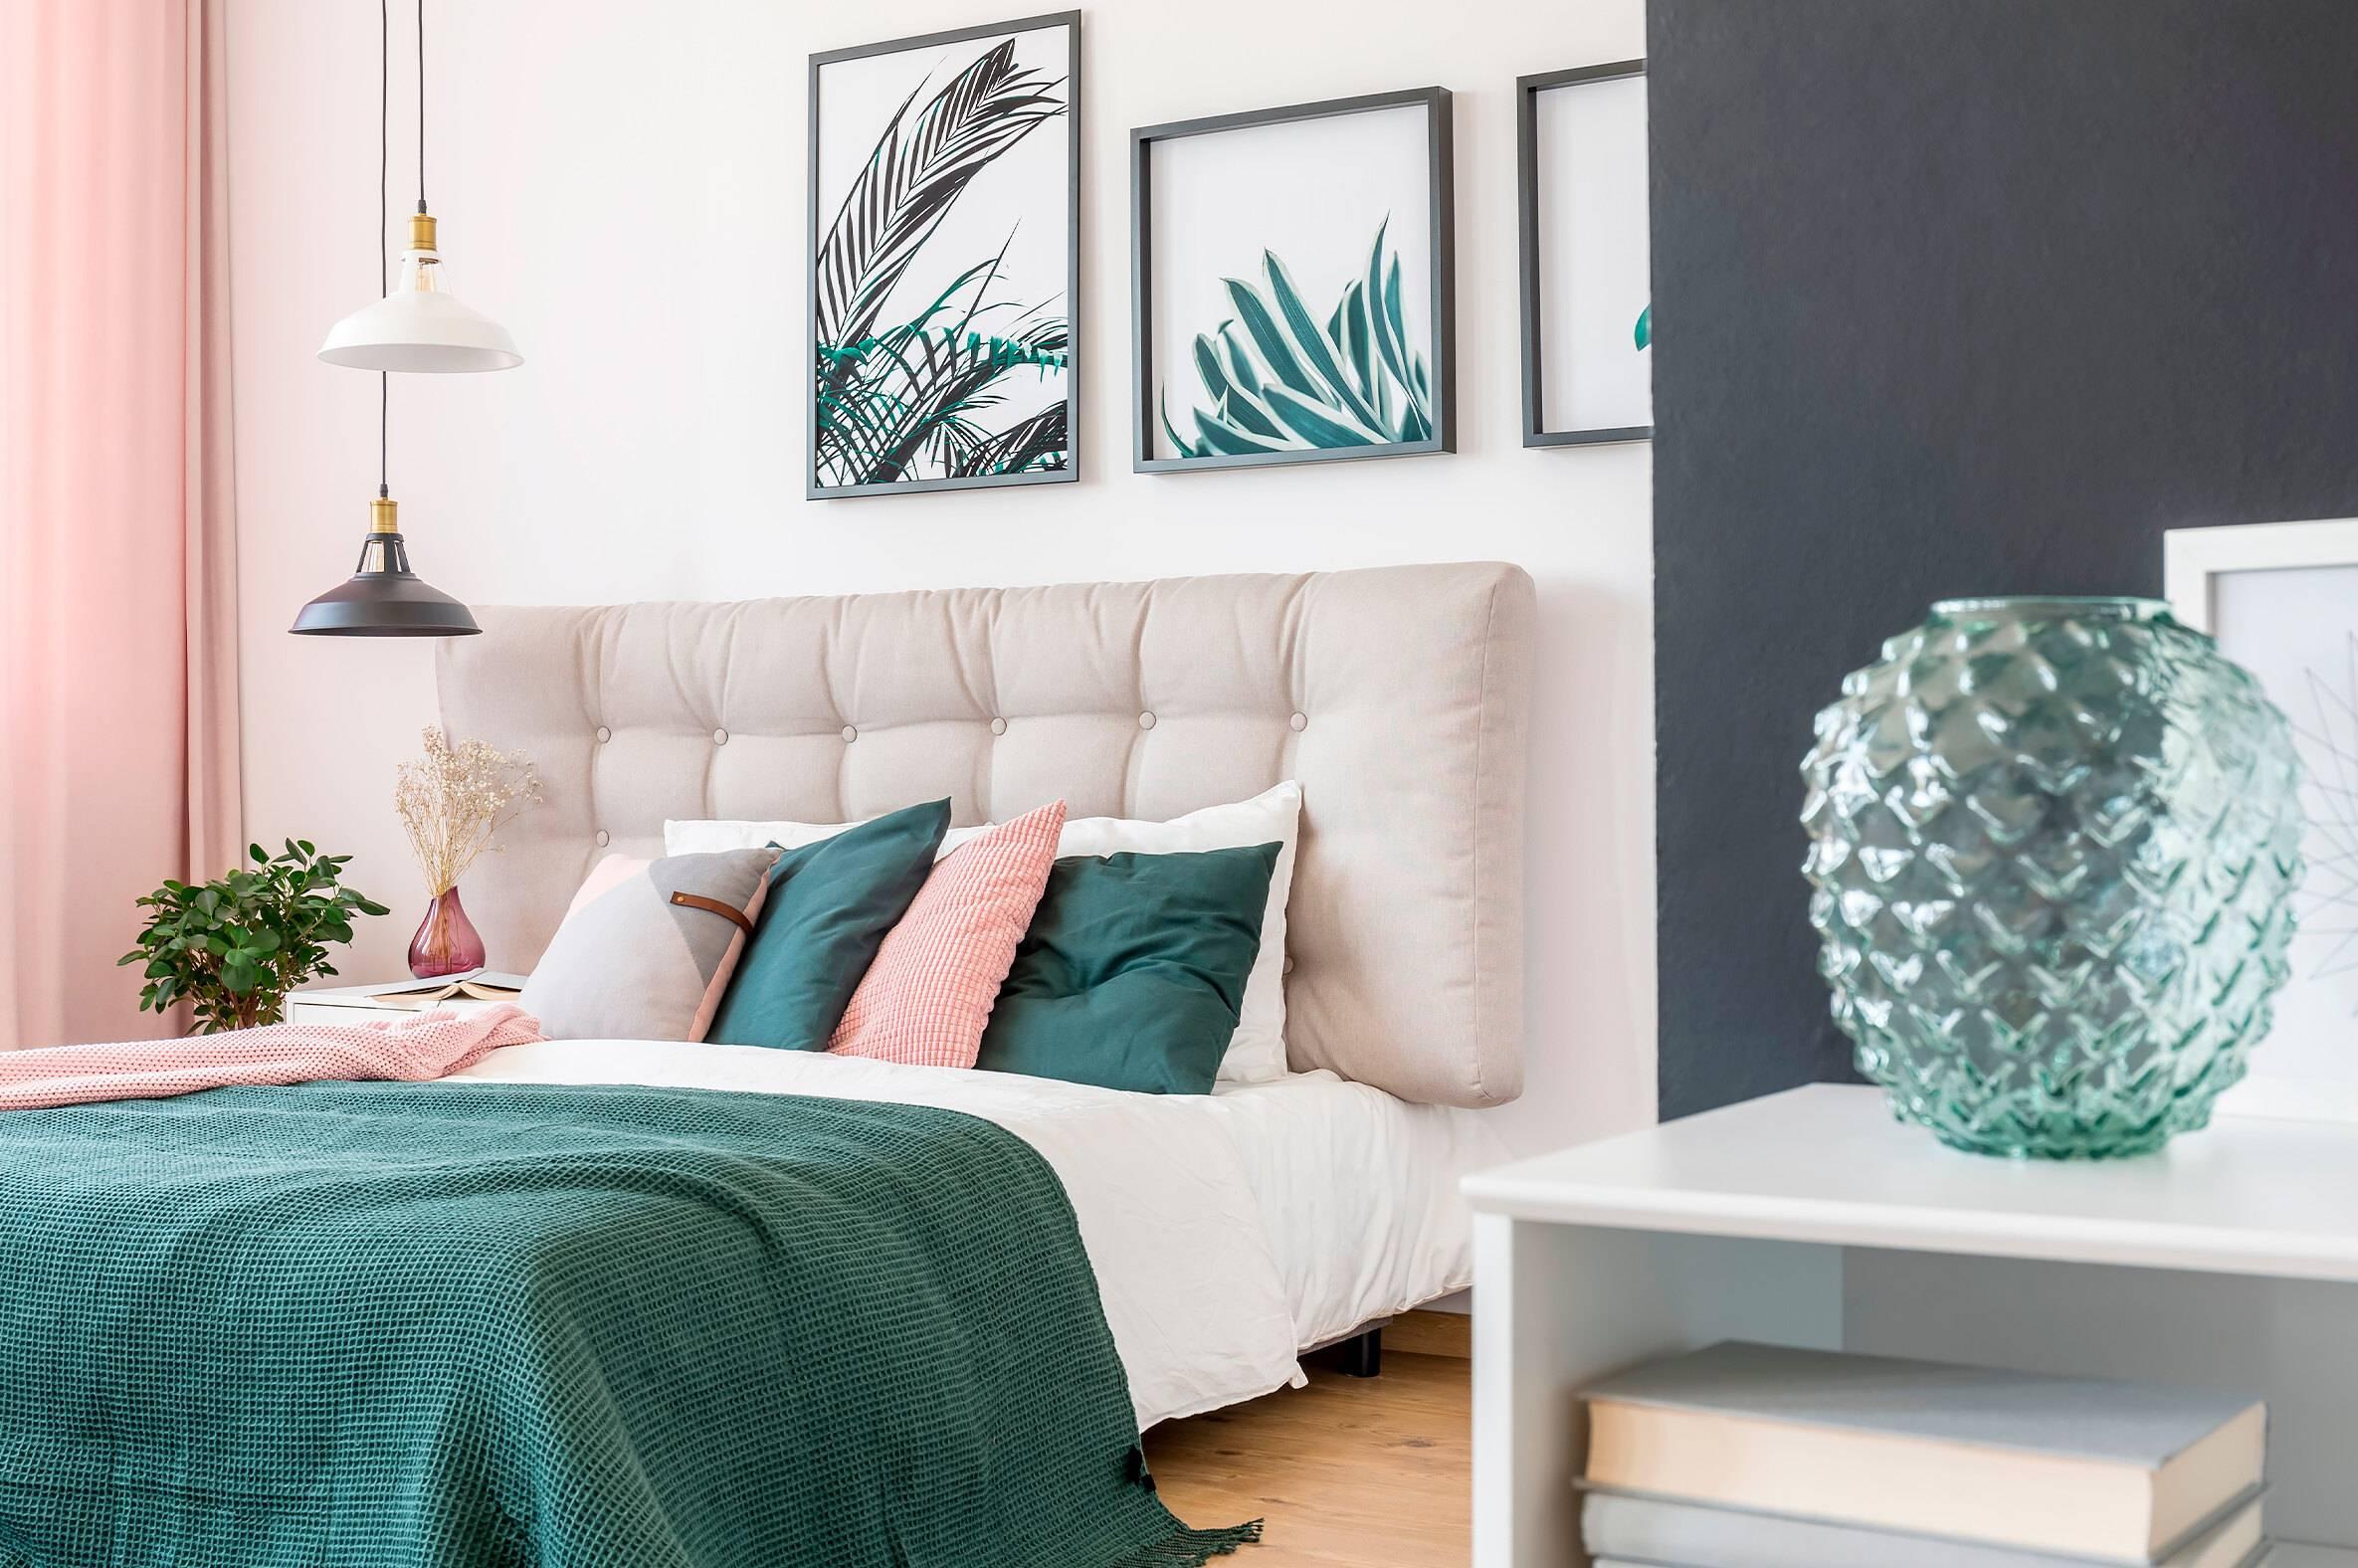 Pink Feminine Beautiful Chic Bedroom Plant Art Green Accents